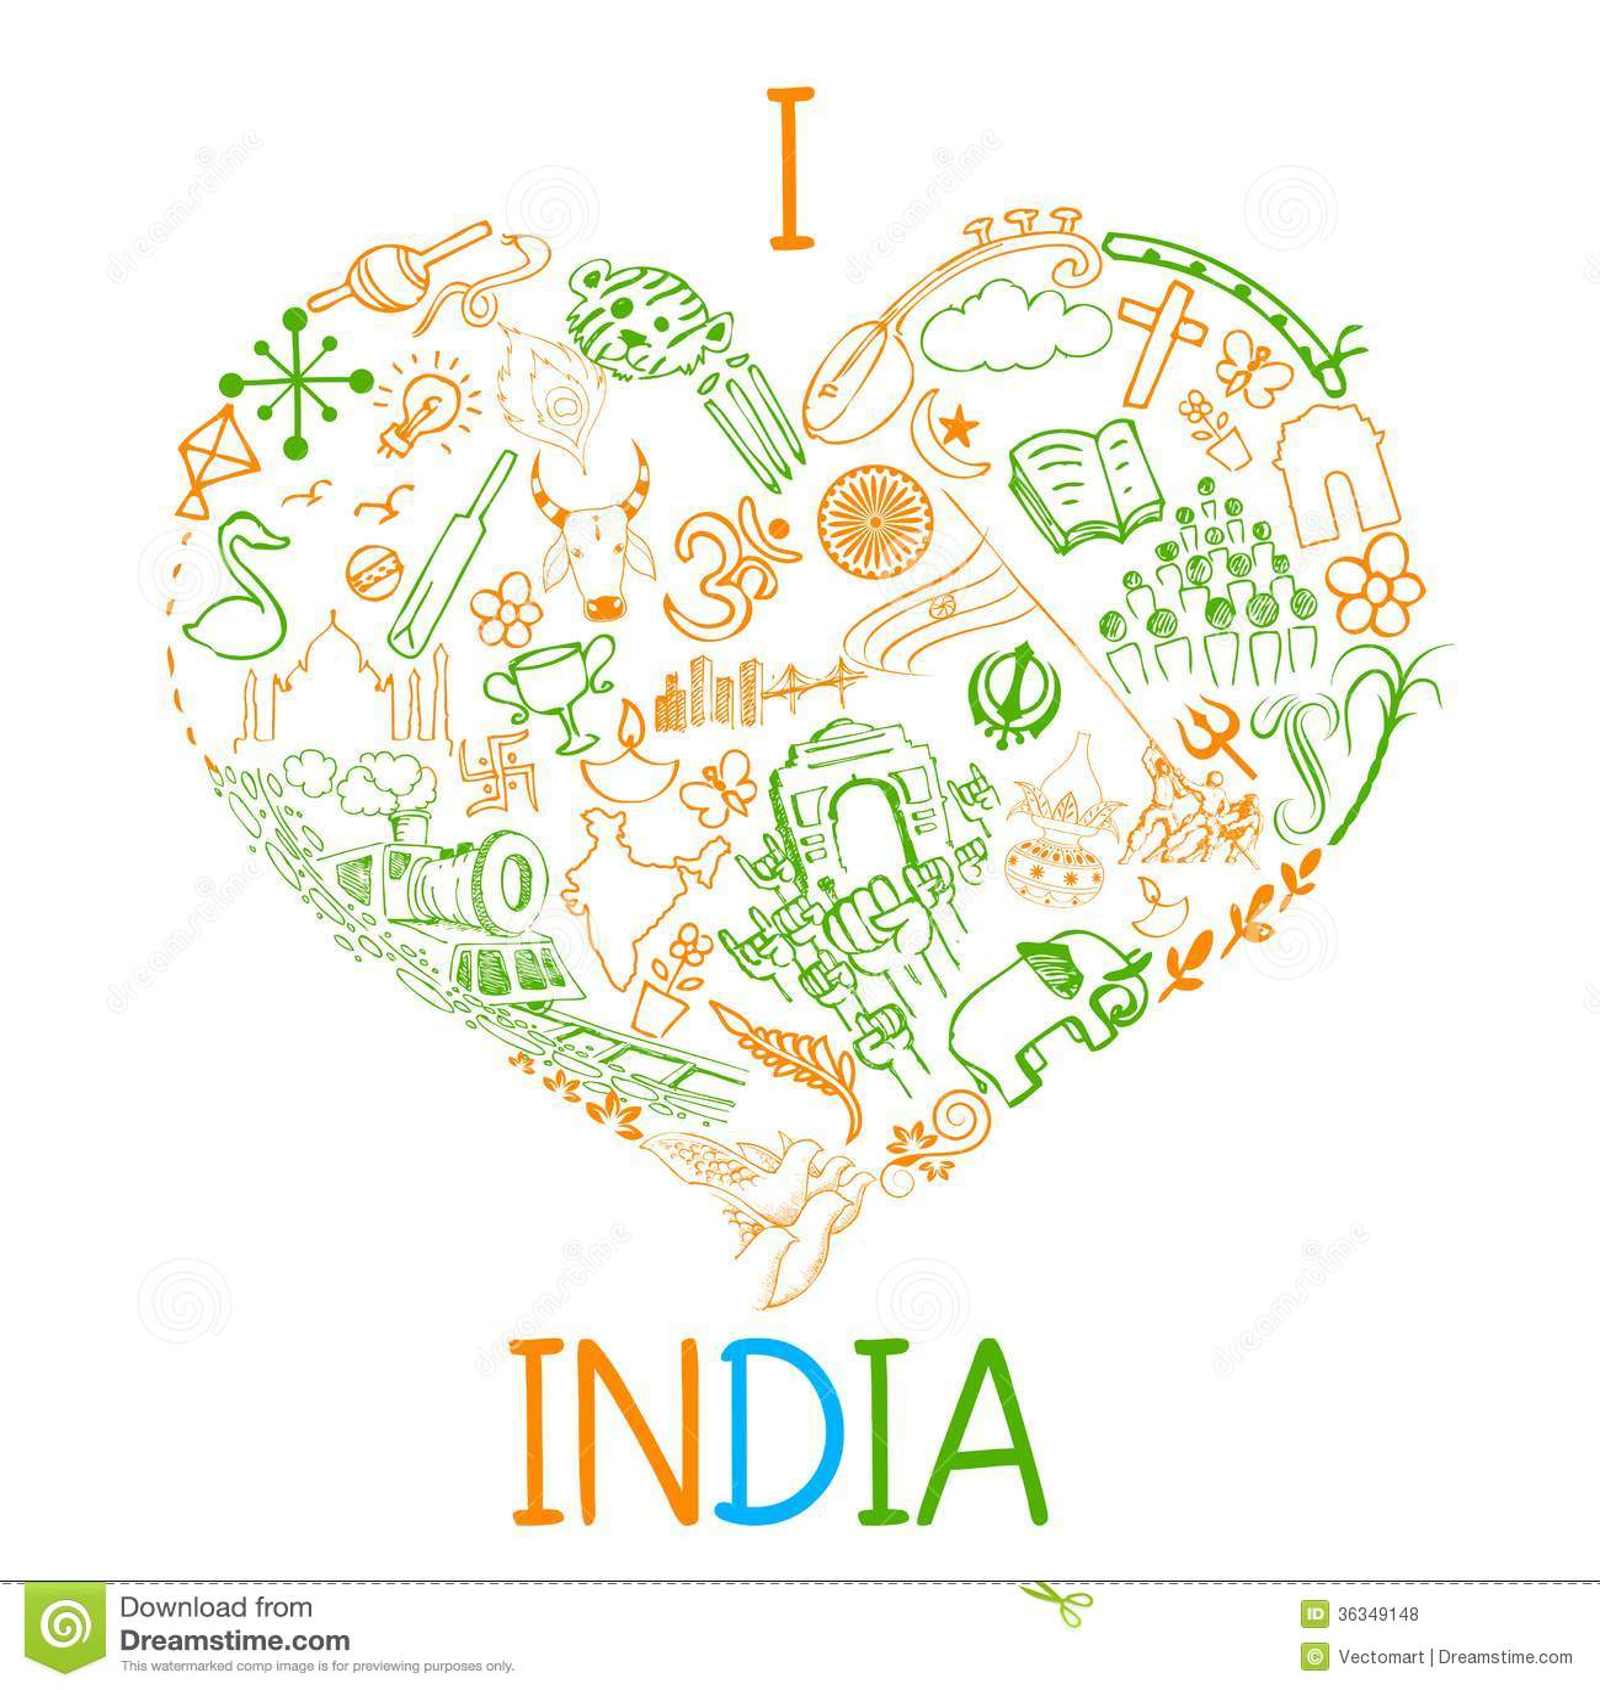 detail i love india - photo #28